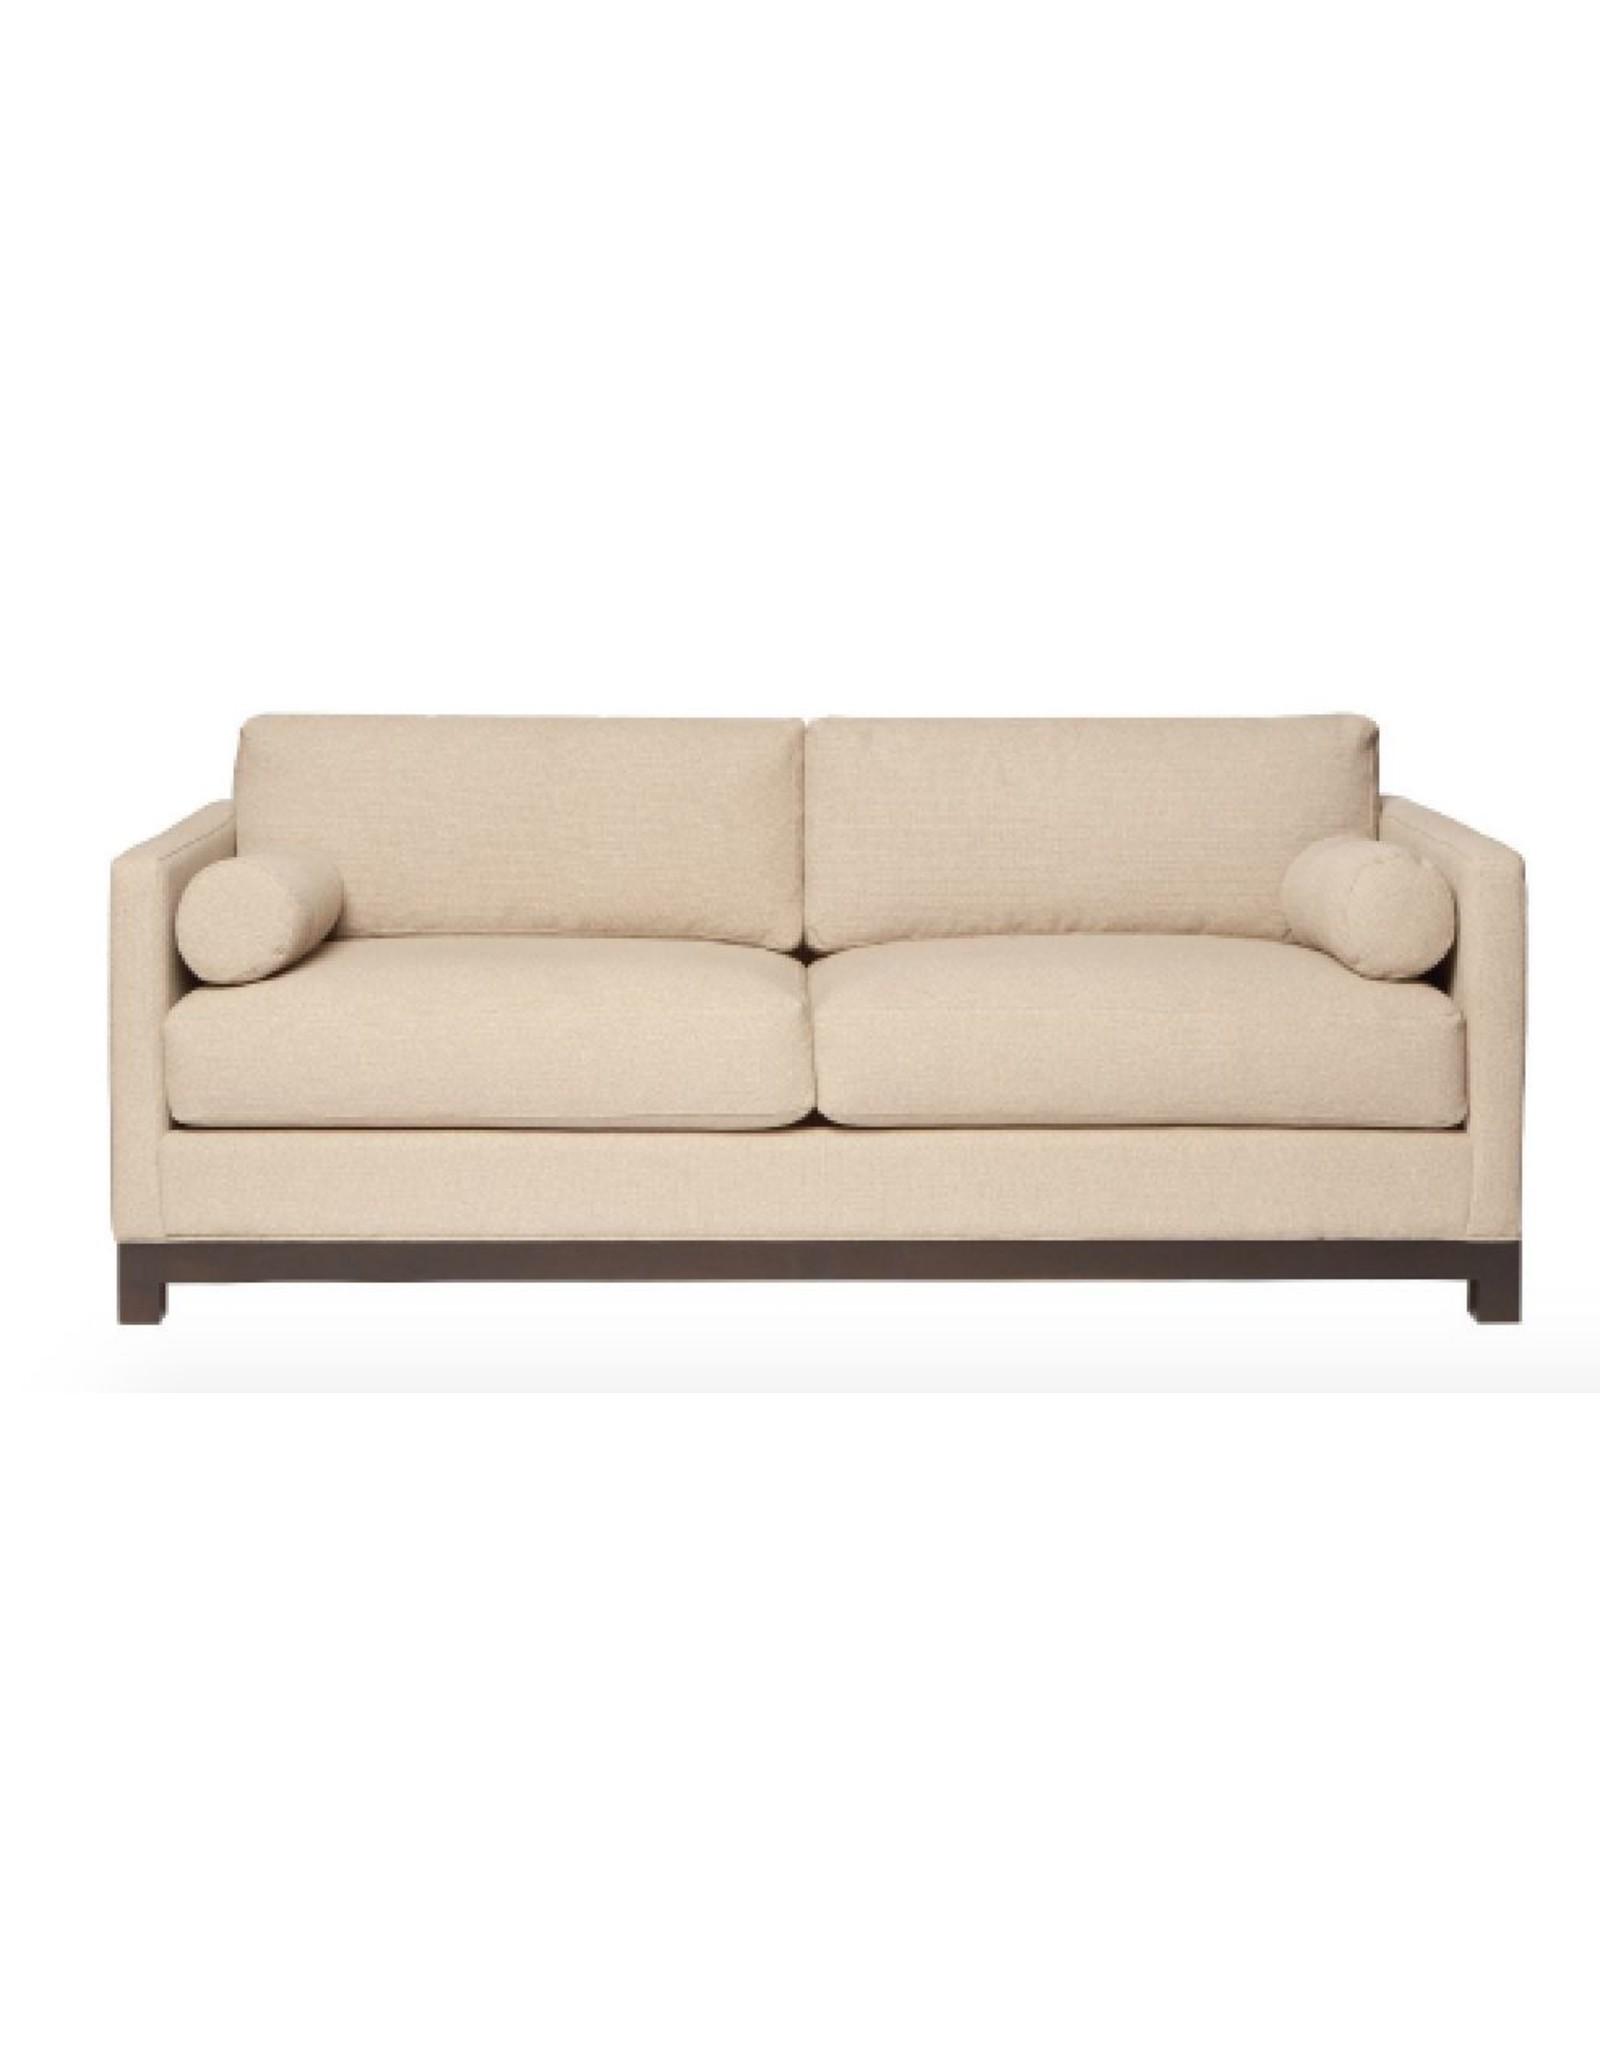 "Cosmo 84"" Upholstered Sofa"